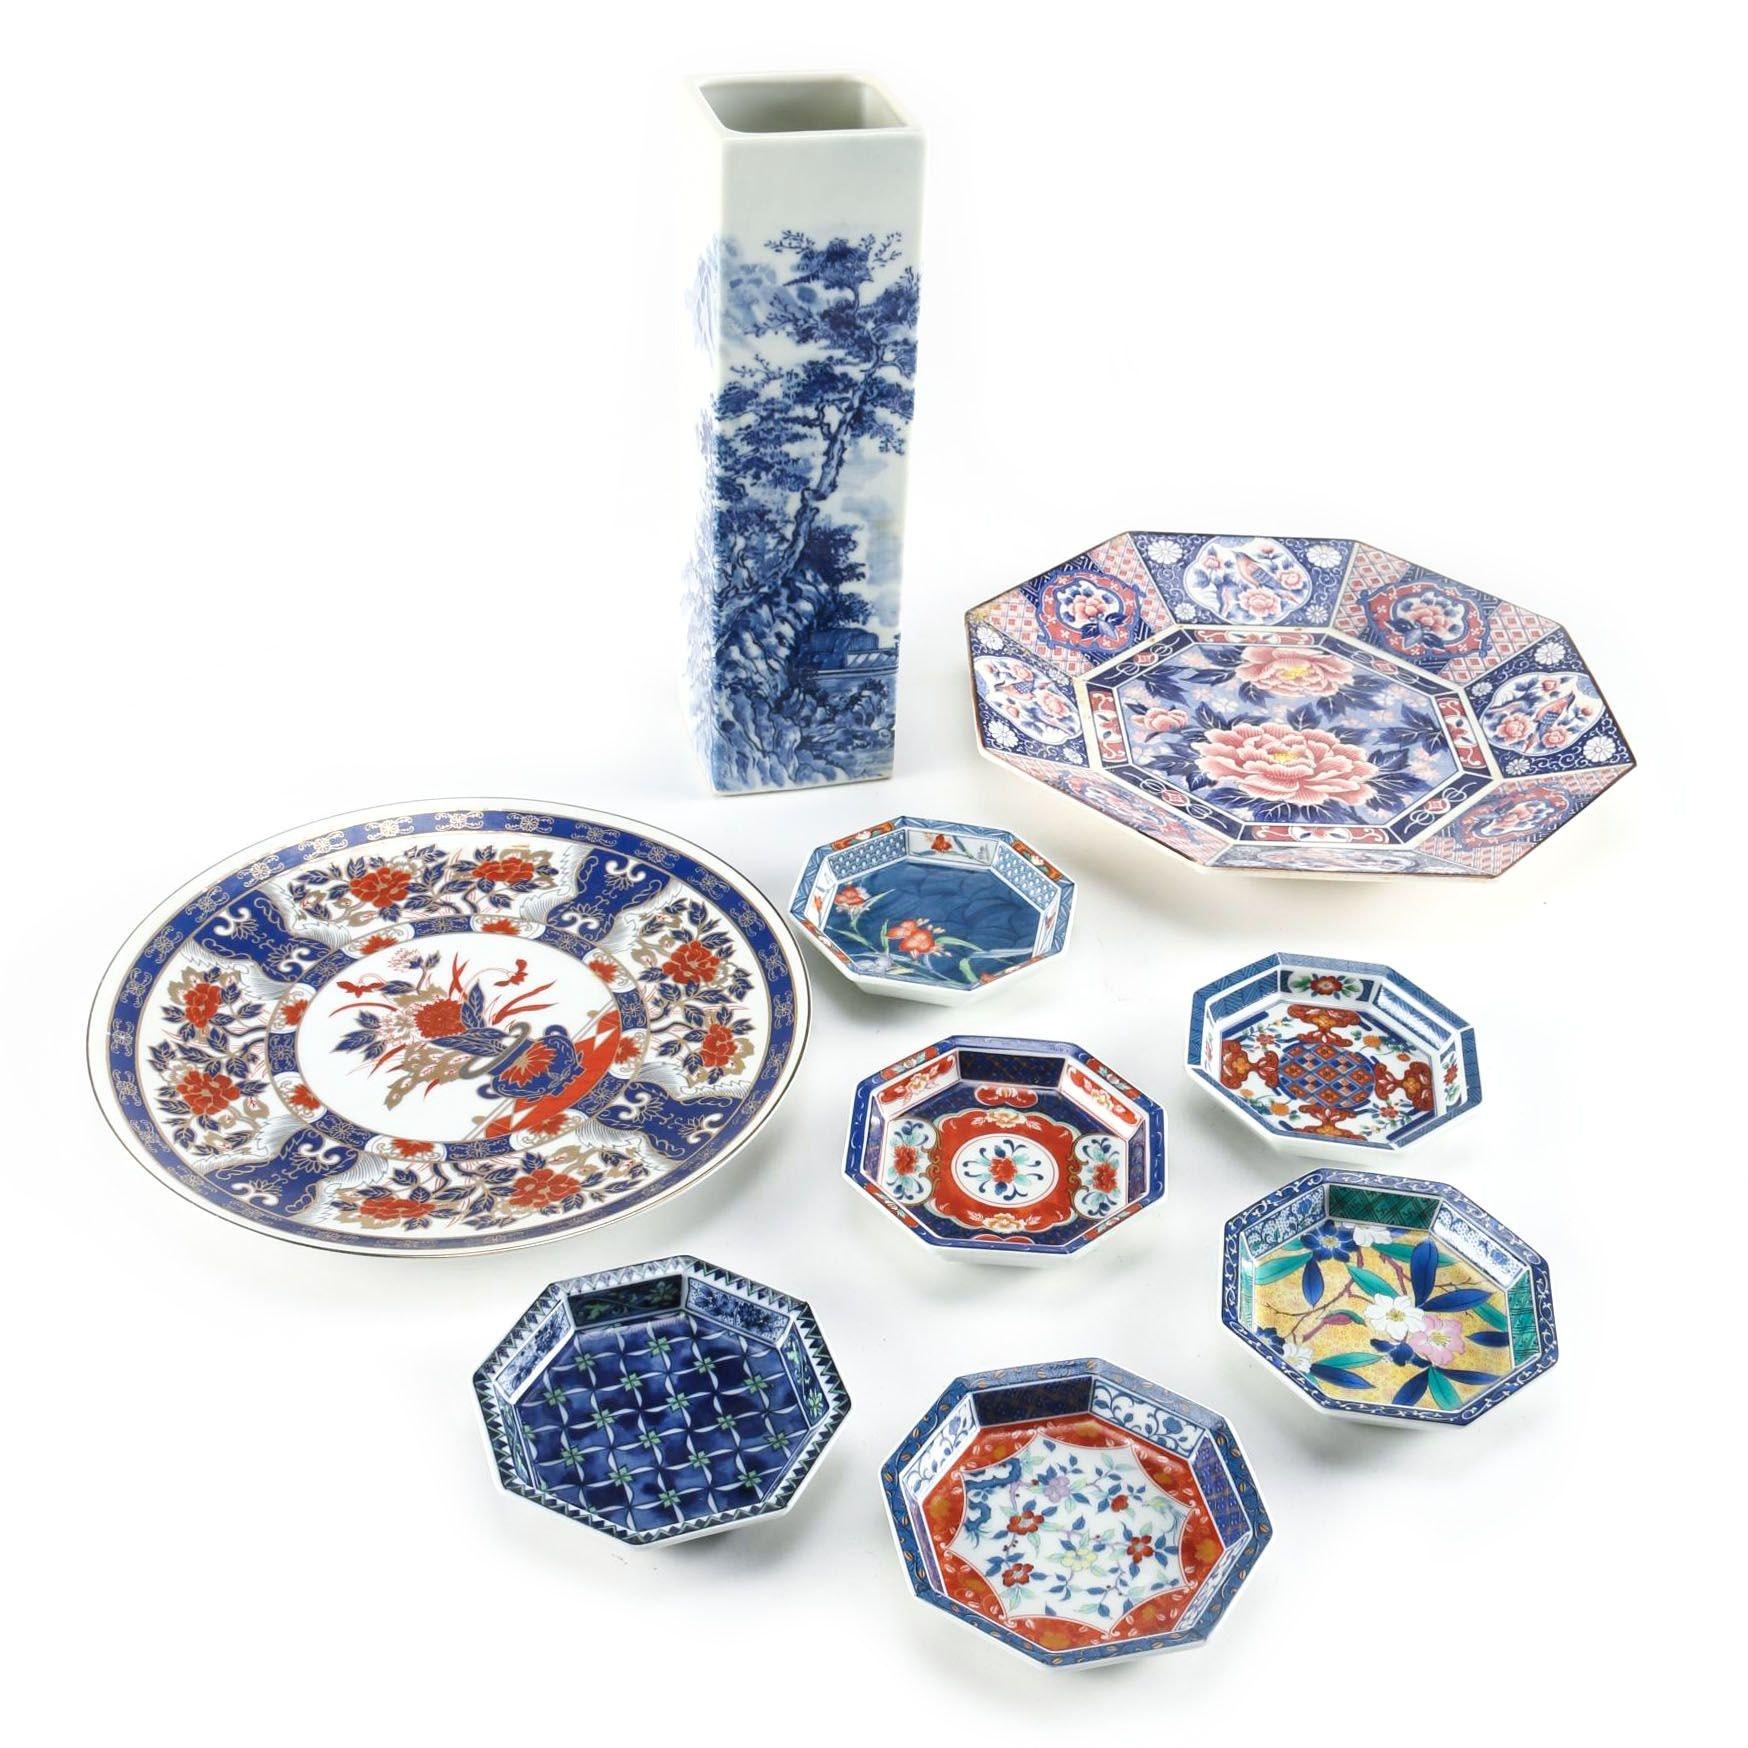 Japanese Ceramic Tableware Featuring Takahashi San Francisco and OCGC Japan Plates ...  sc 1 st  EBTH.com & Japanese Ceramic Tableware Featuring Takahashi San Francisco and ...